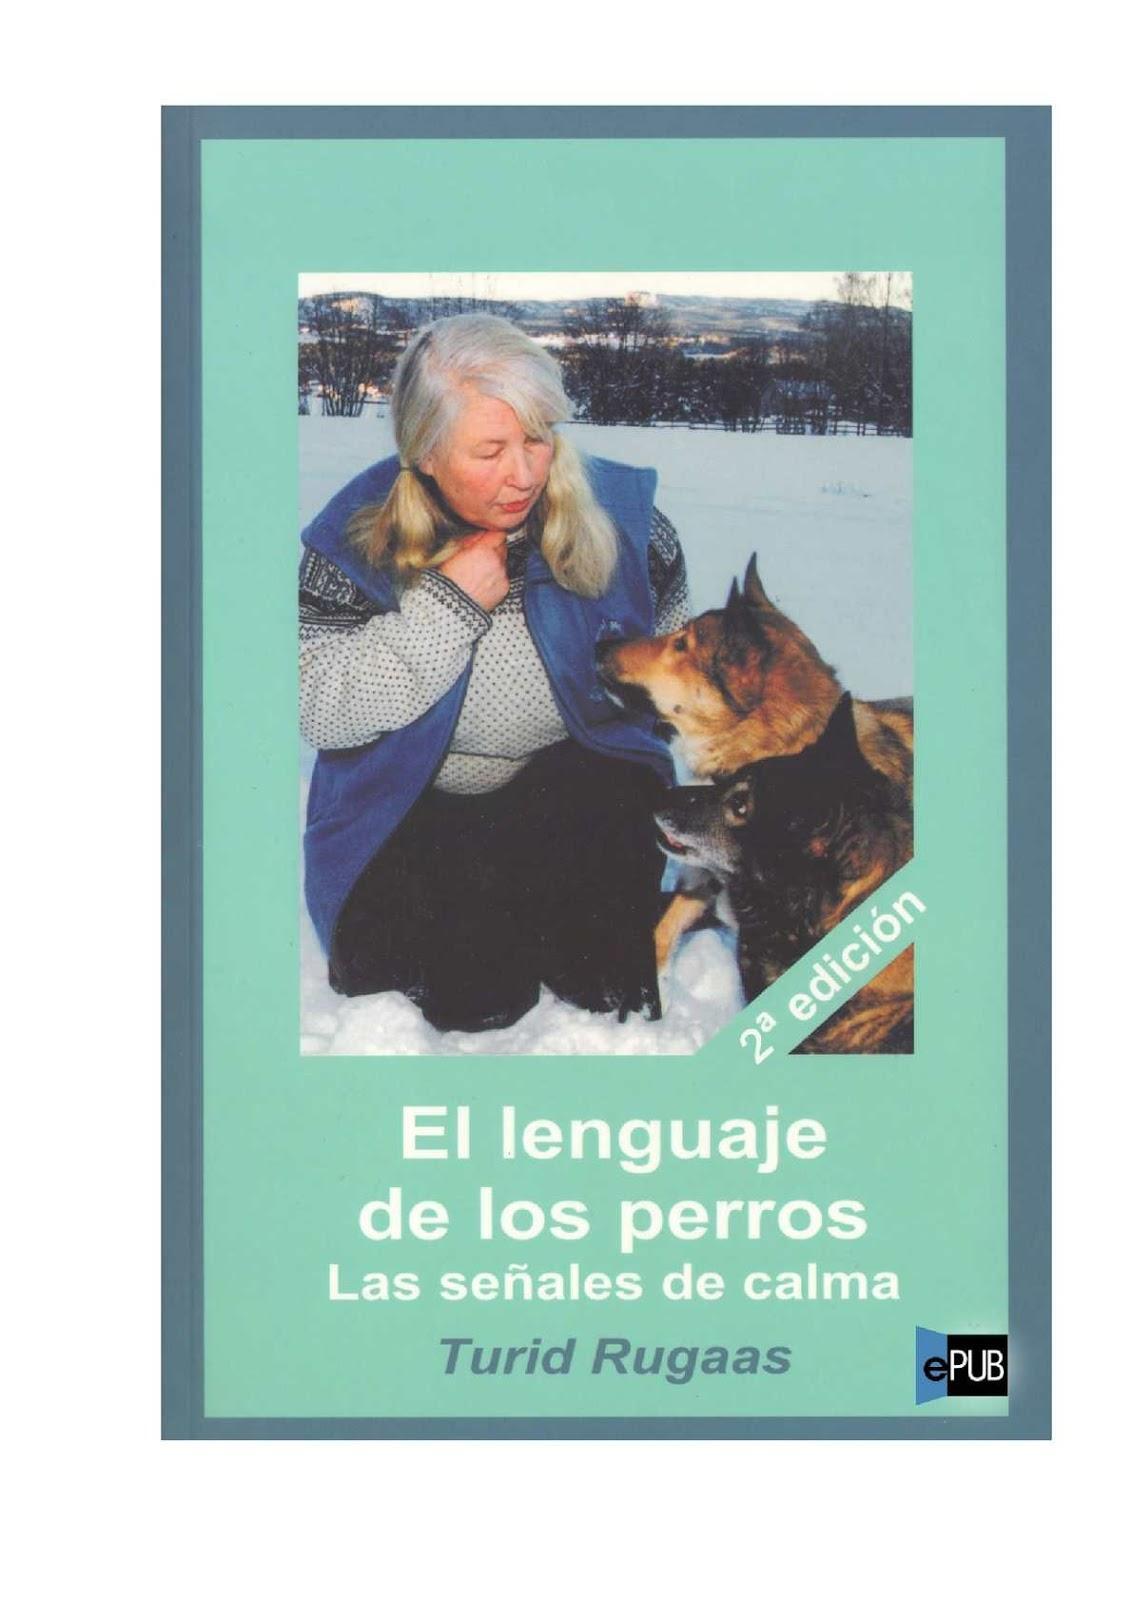 espanol que trate sobre un lenguaje de: